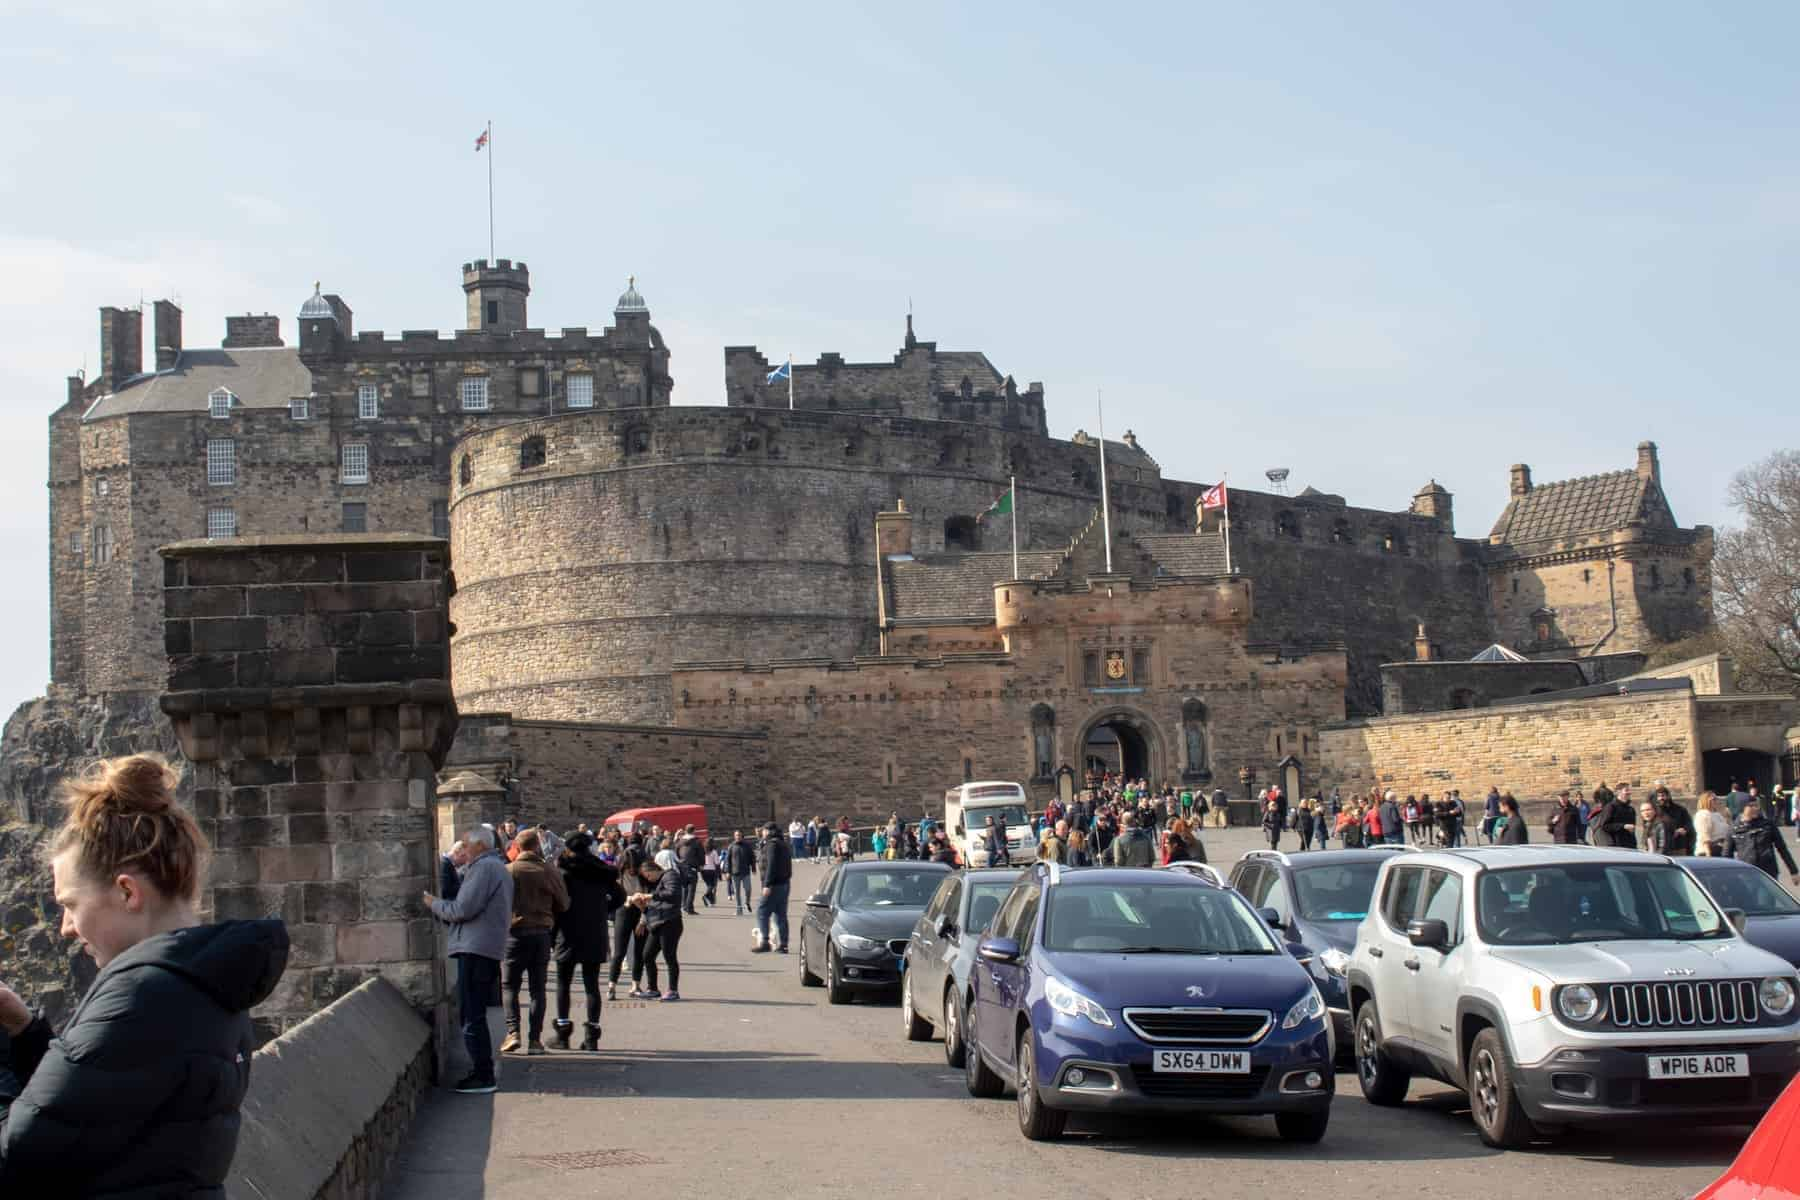 Edinburgh, Scotland view of the busy entrance to Edinburgh Castle